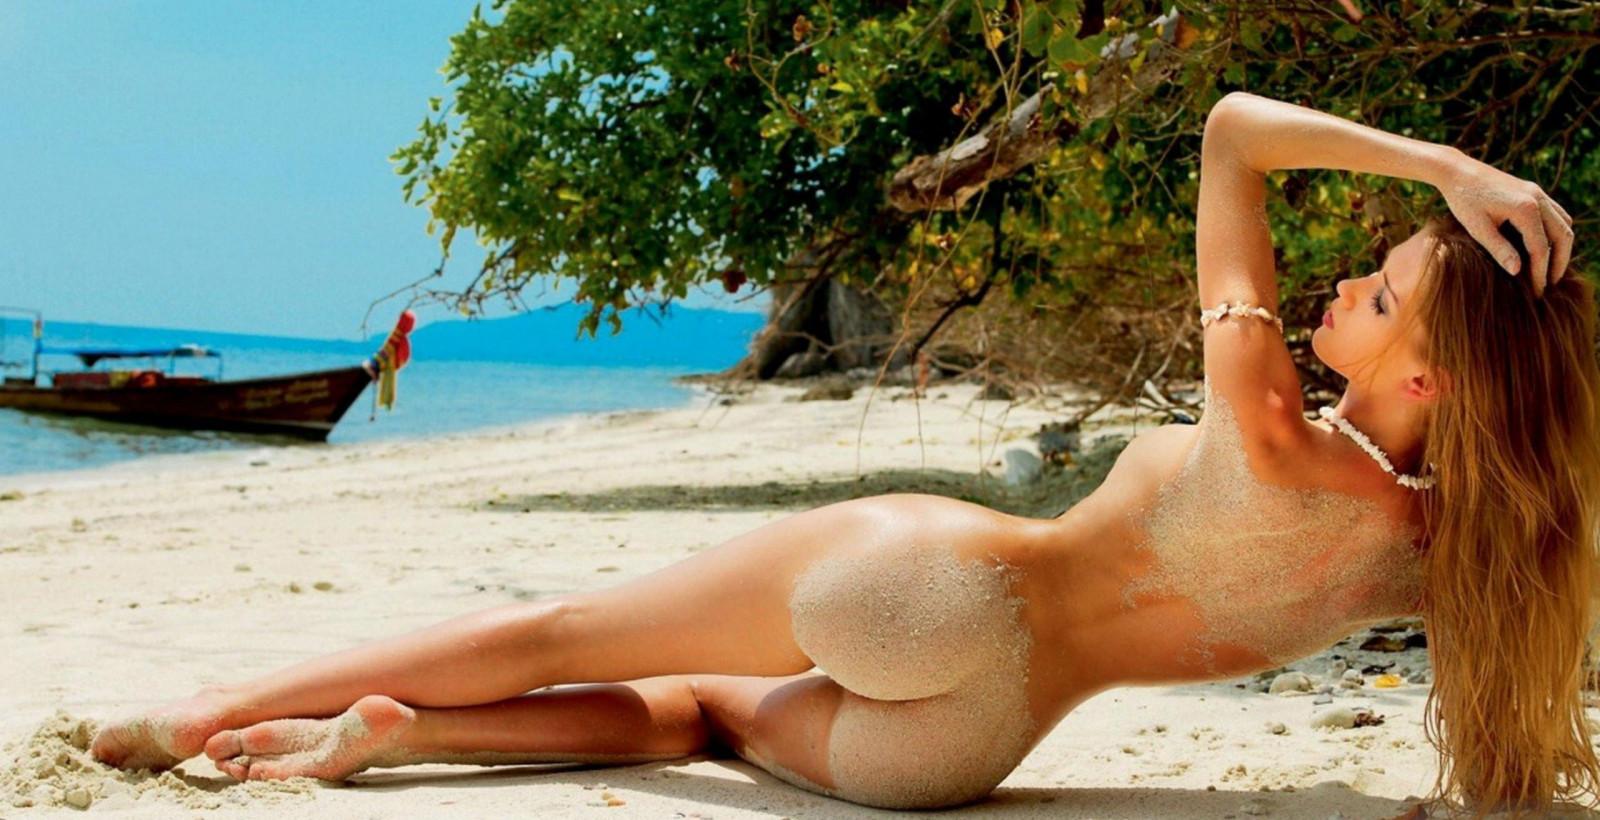 приколы над девушками на пляже любители